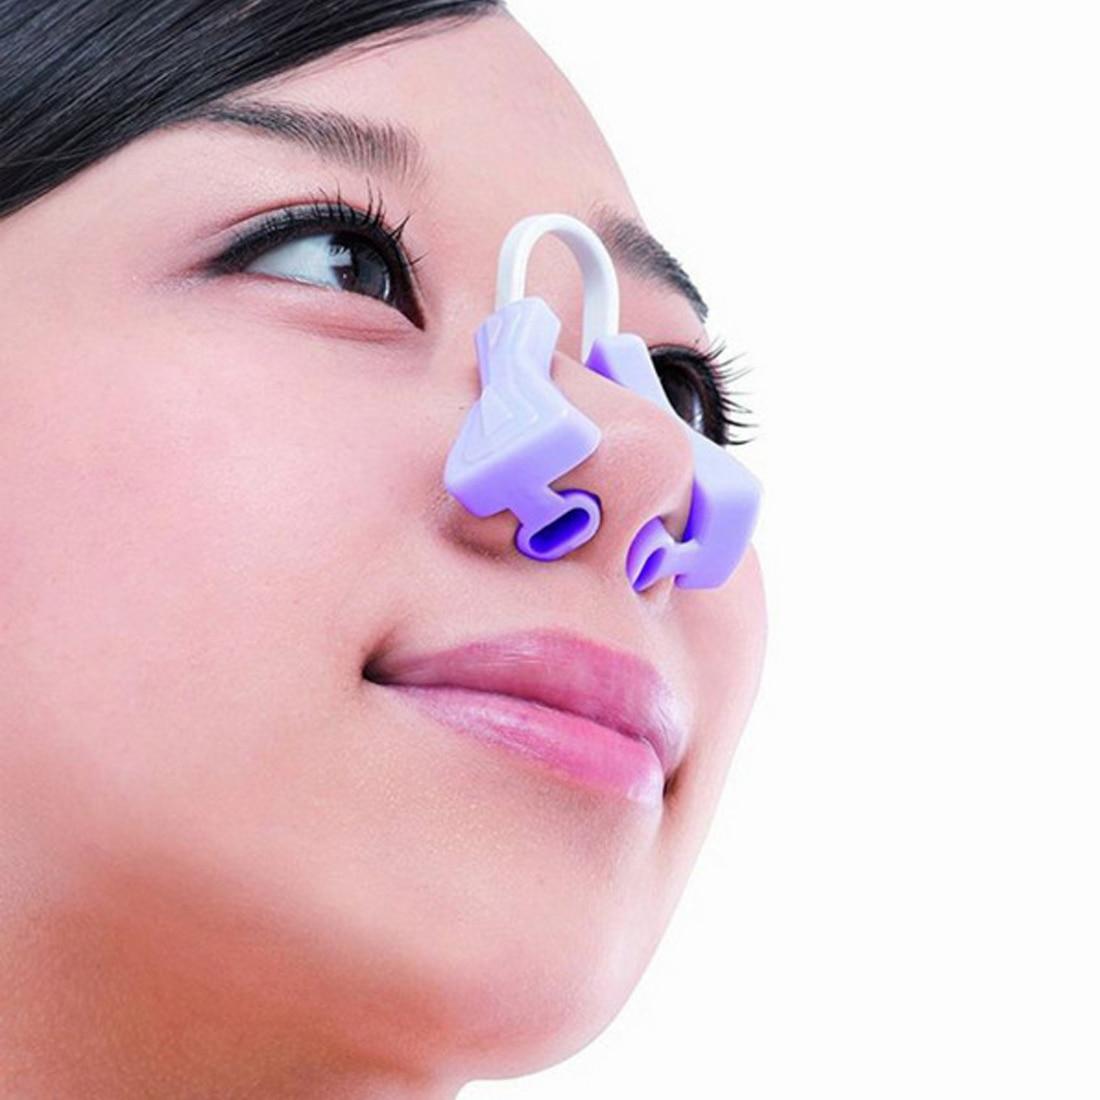 Imagen de Beauty care nose lift shaping clip scissors plastic correction beauty nose clip correction massage makeup facial care tools